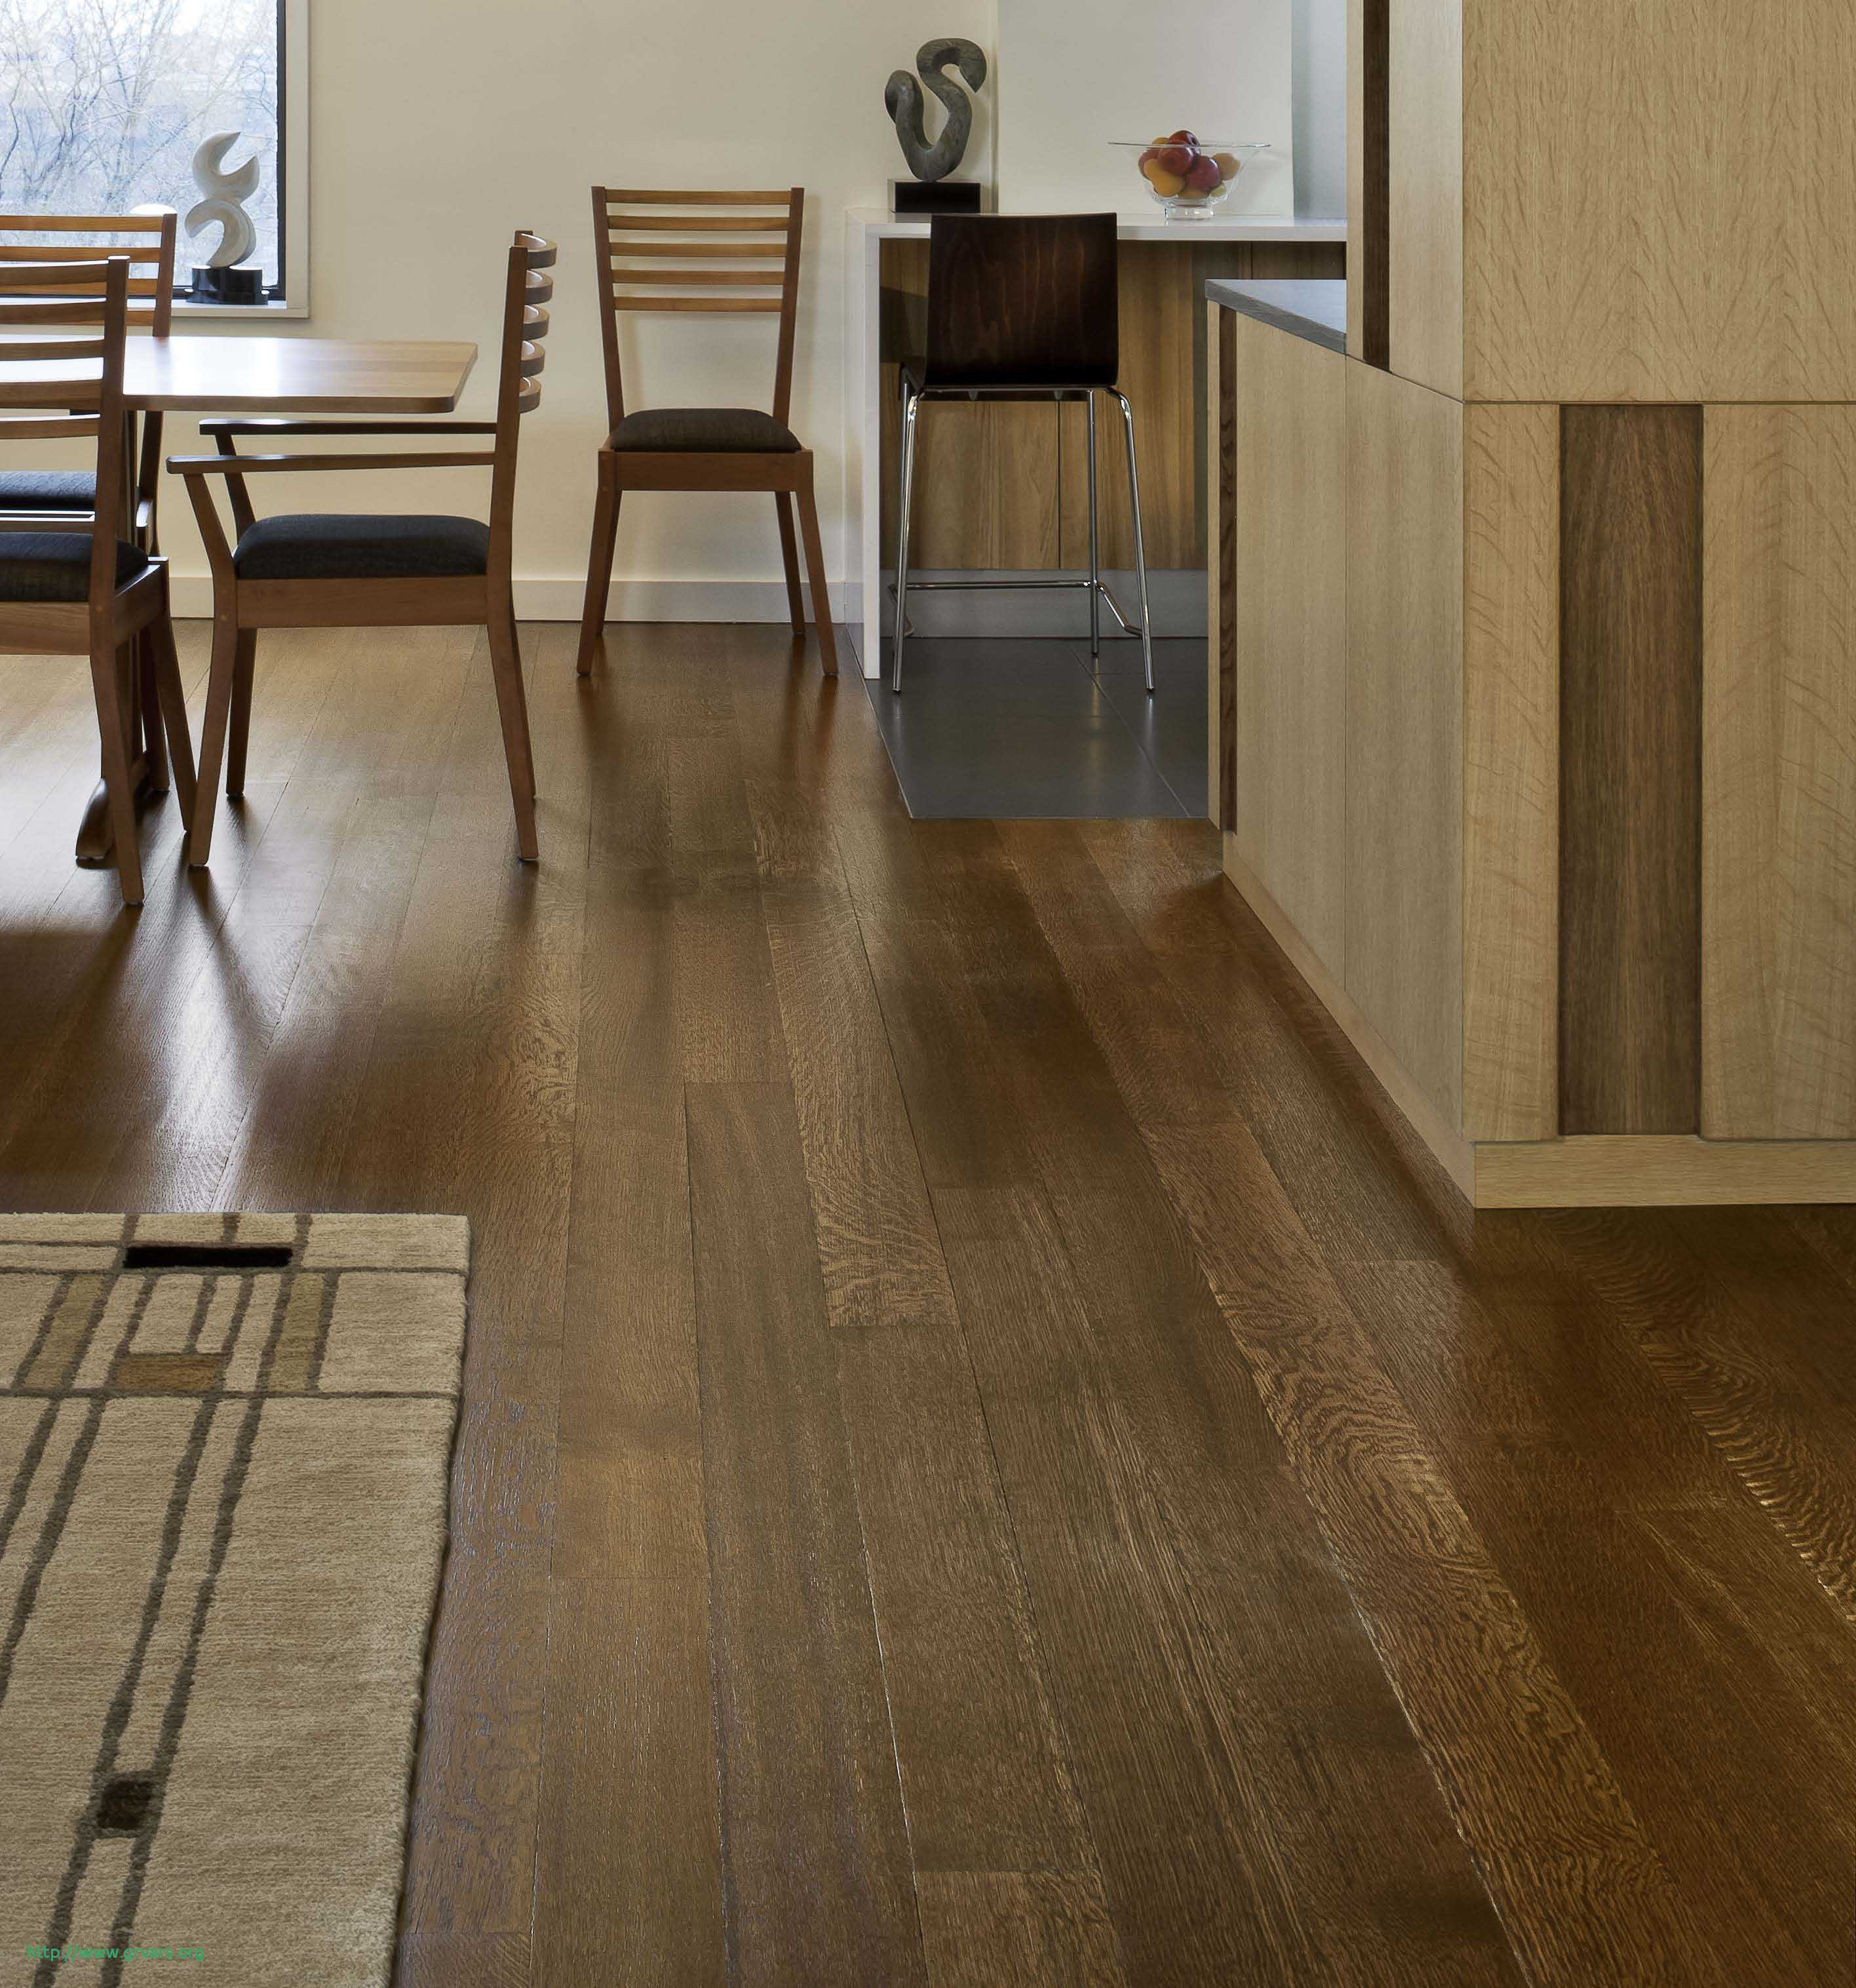 discount hardwood flooring winston salem nc of hardwood floor sanders 21 inspirant best prices for laminate wood pertaining to hardwood floor sanders 21 inspirant best prices for laminate wood flooring